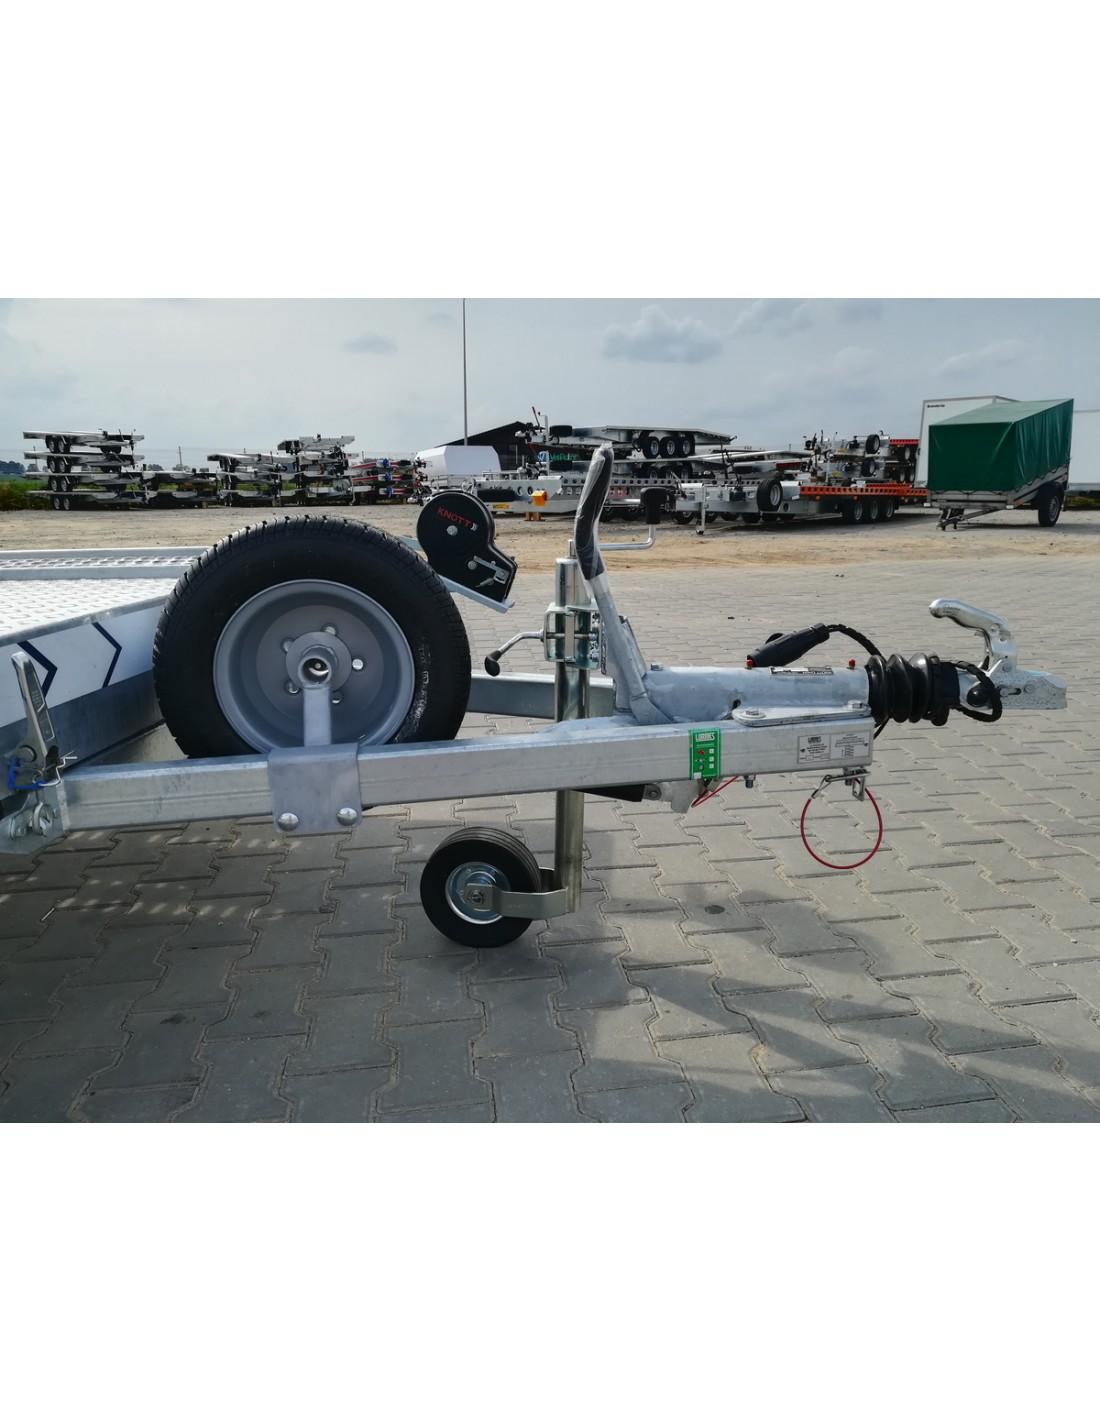 LORRIES tilting Car Transporter PLI 27-5021 integrated ramps